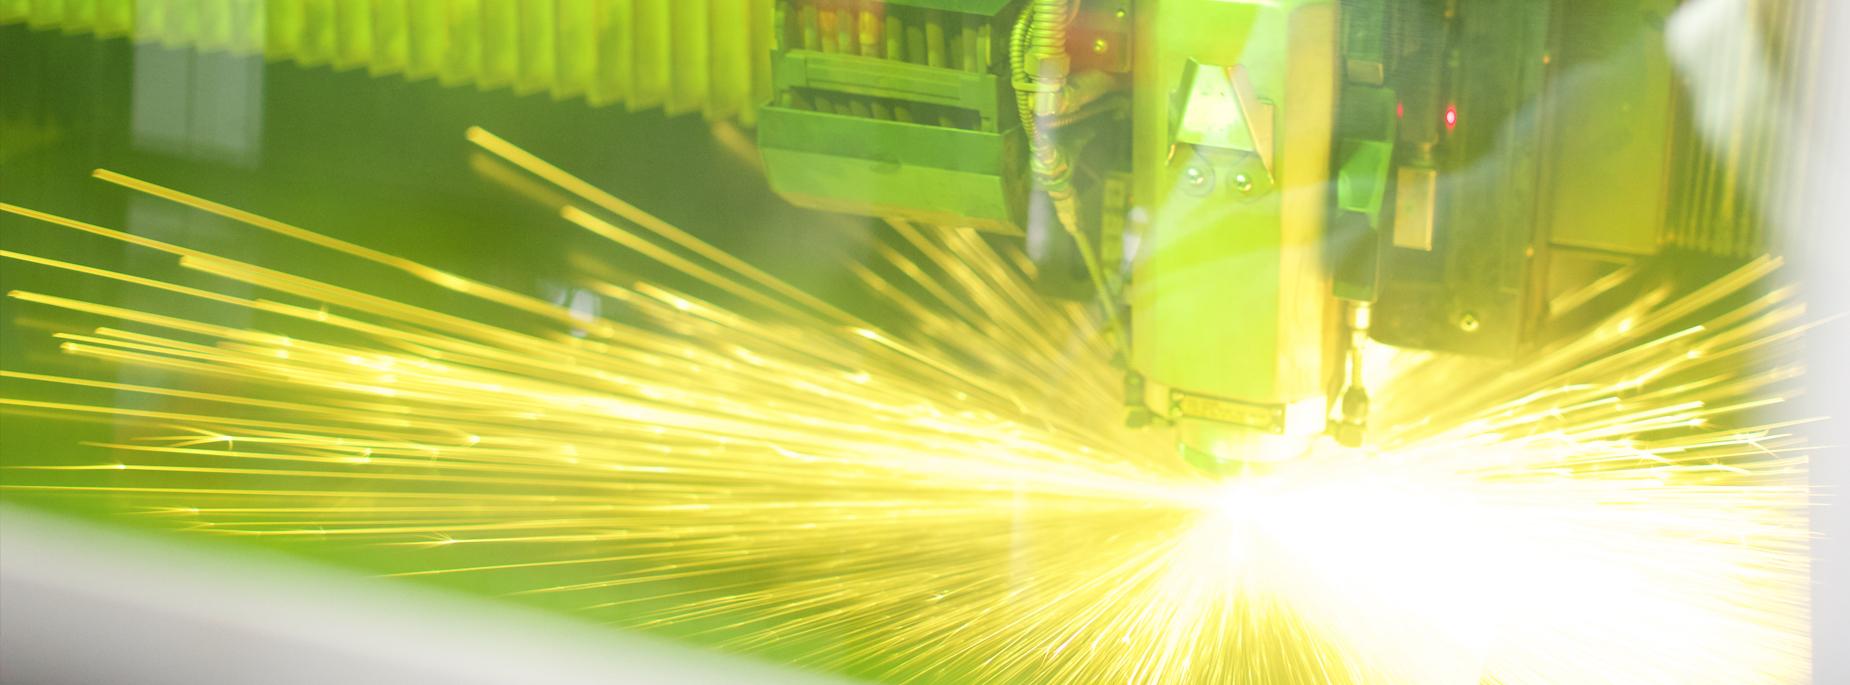 CNC Laser Cutting Midlands